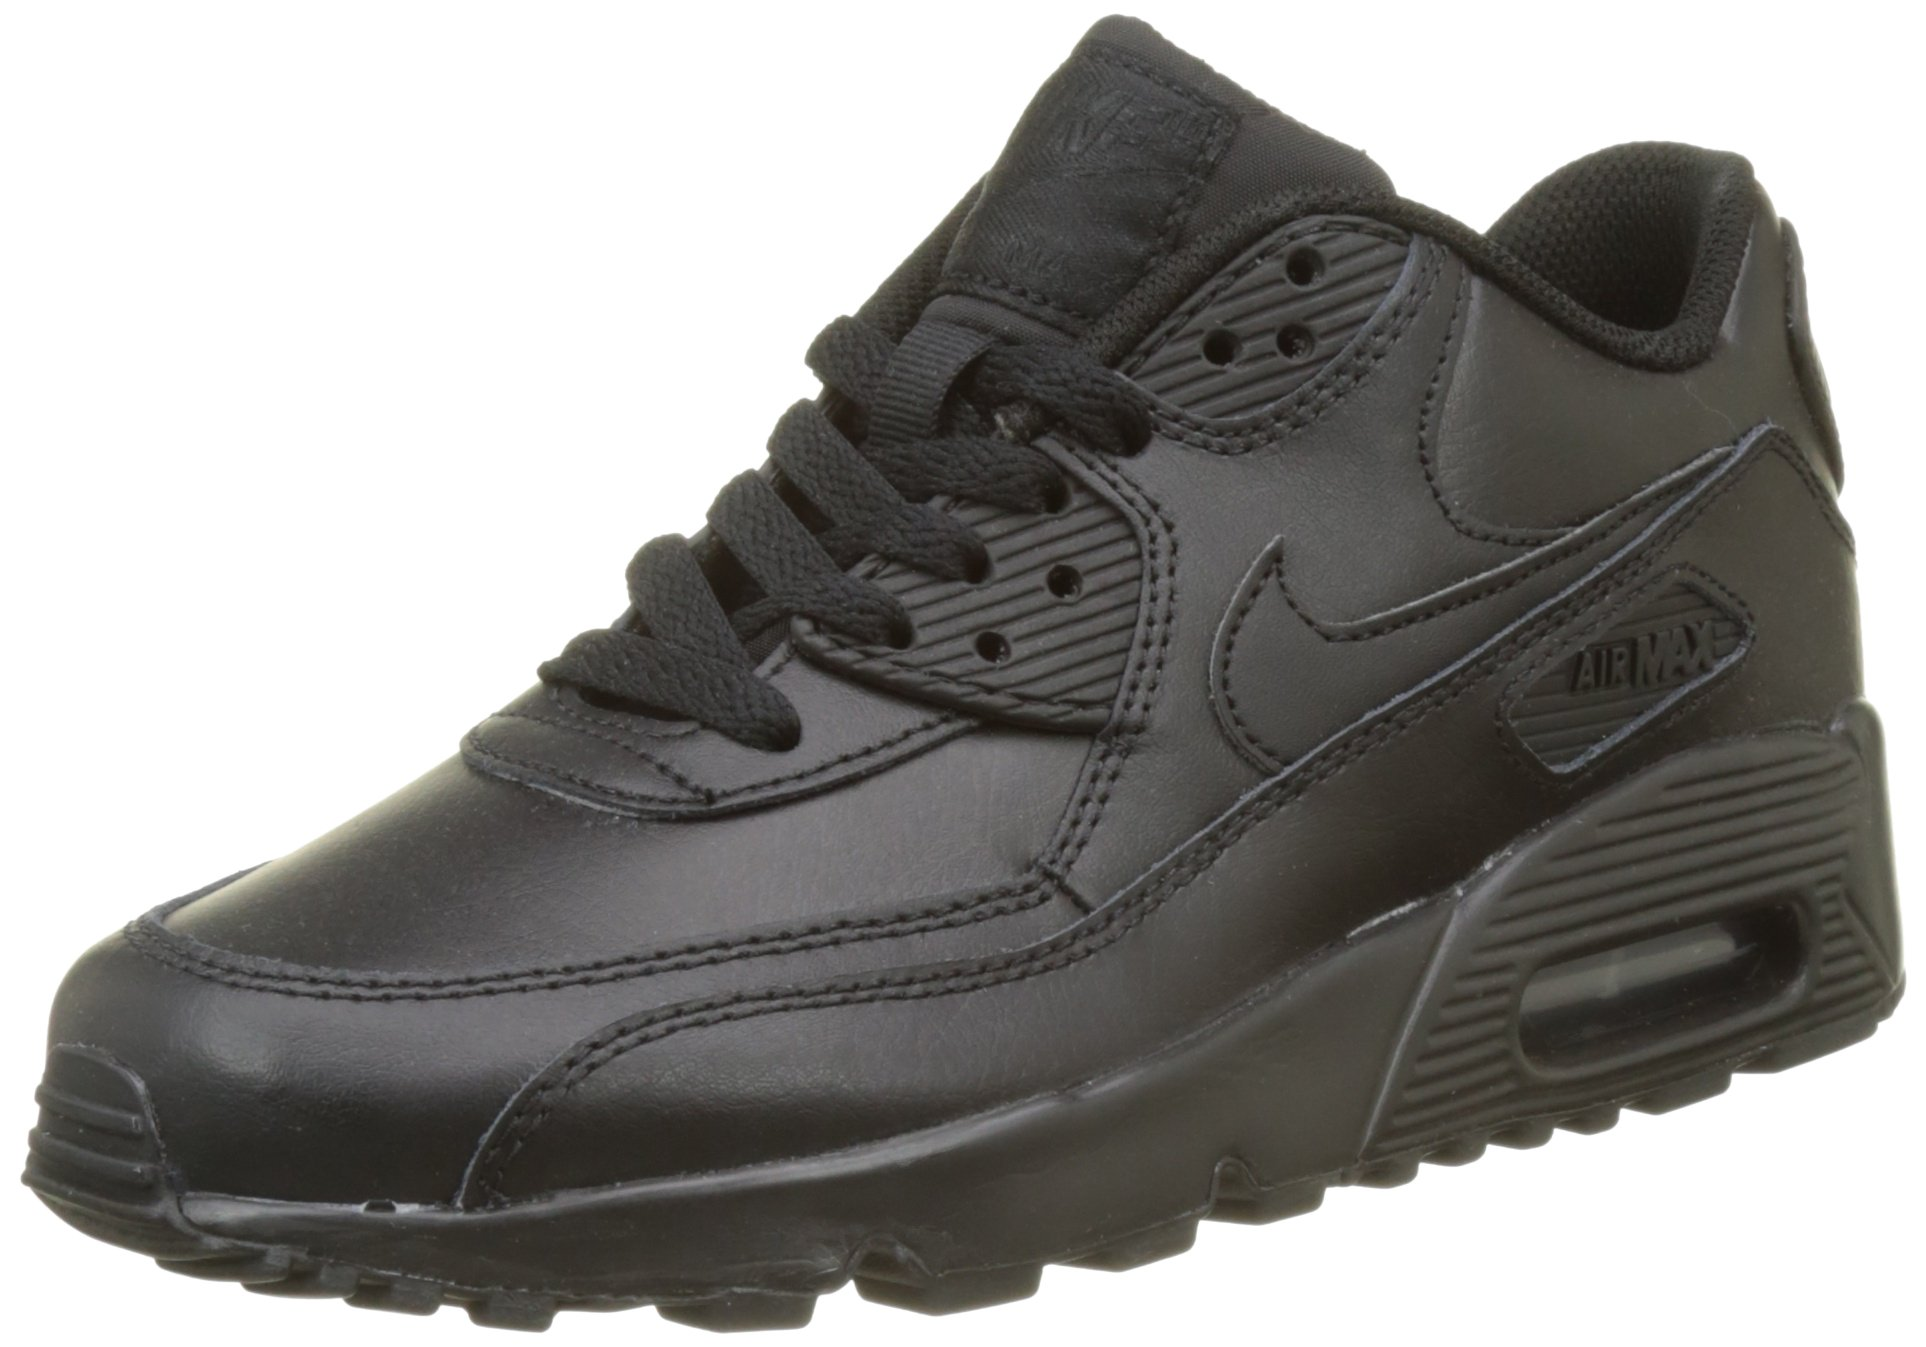 Nike 833412-001 Kid's Air Max 90 Leather Running Shoes, Black/Black, 5 M US Big Kid